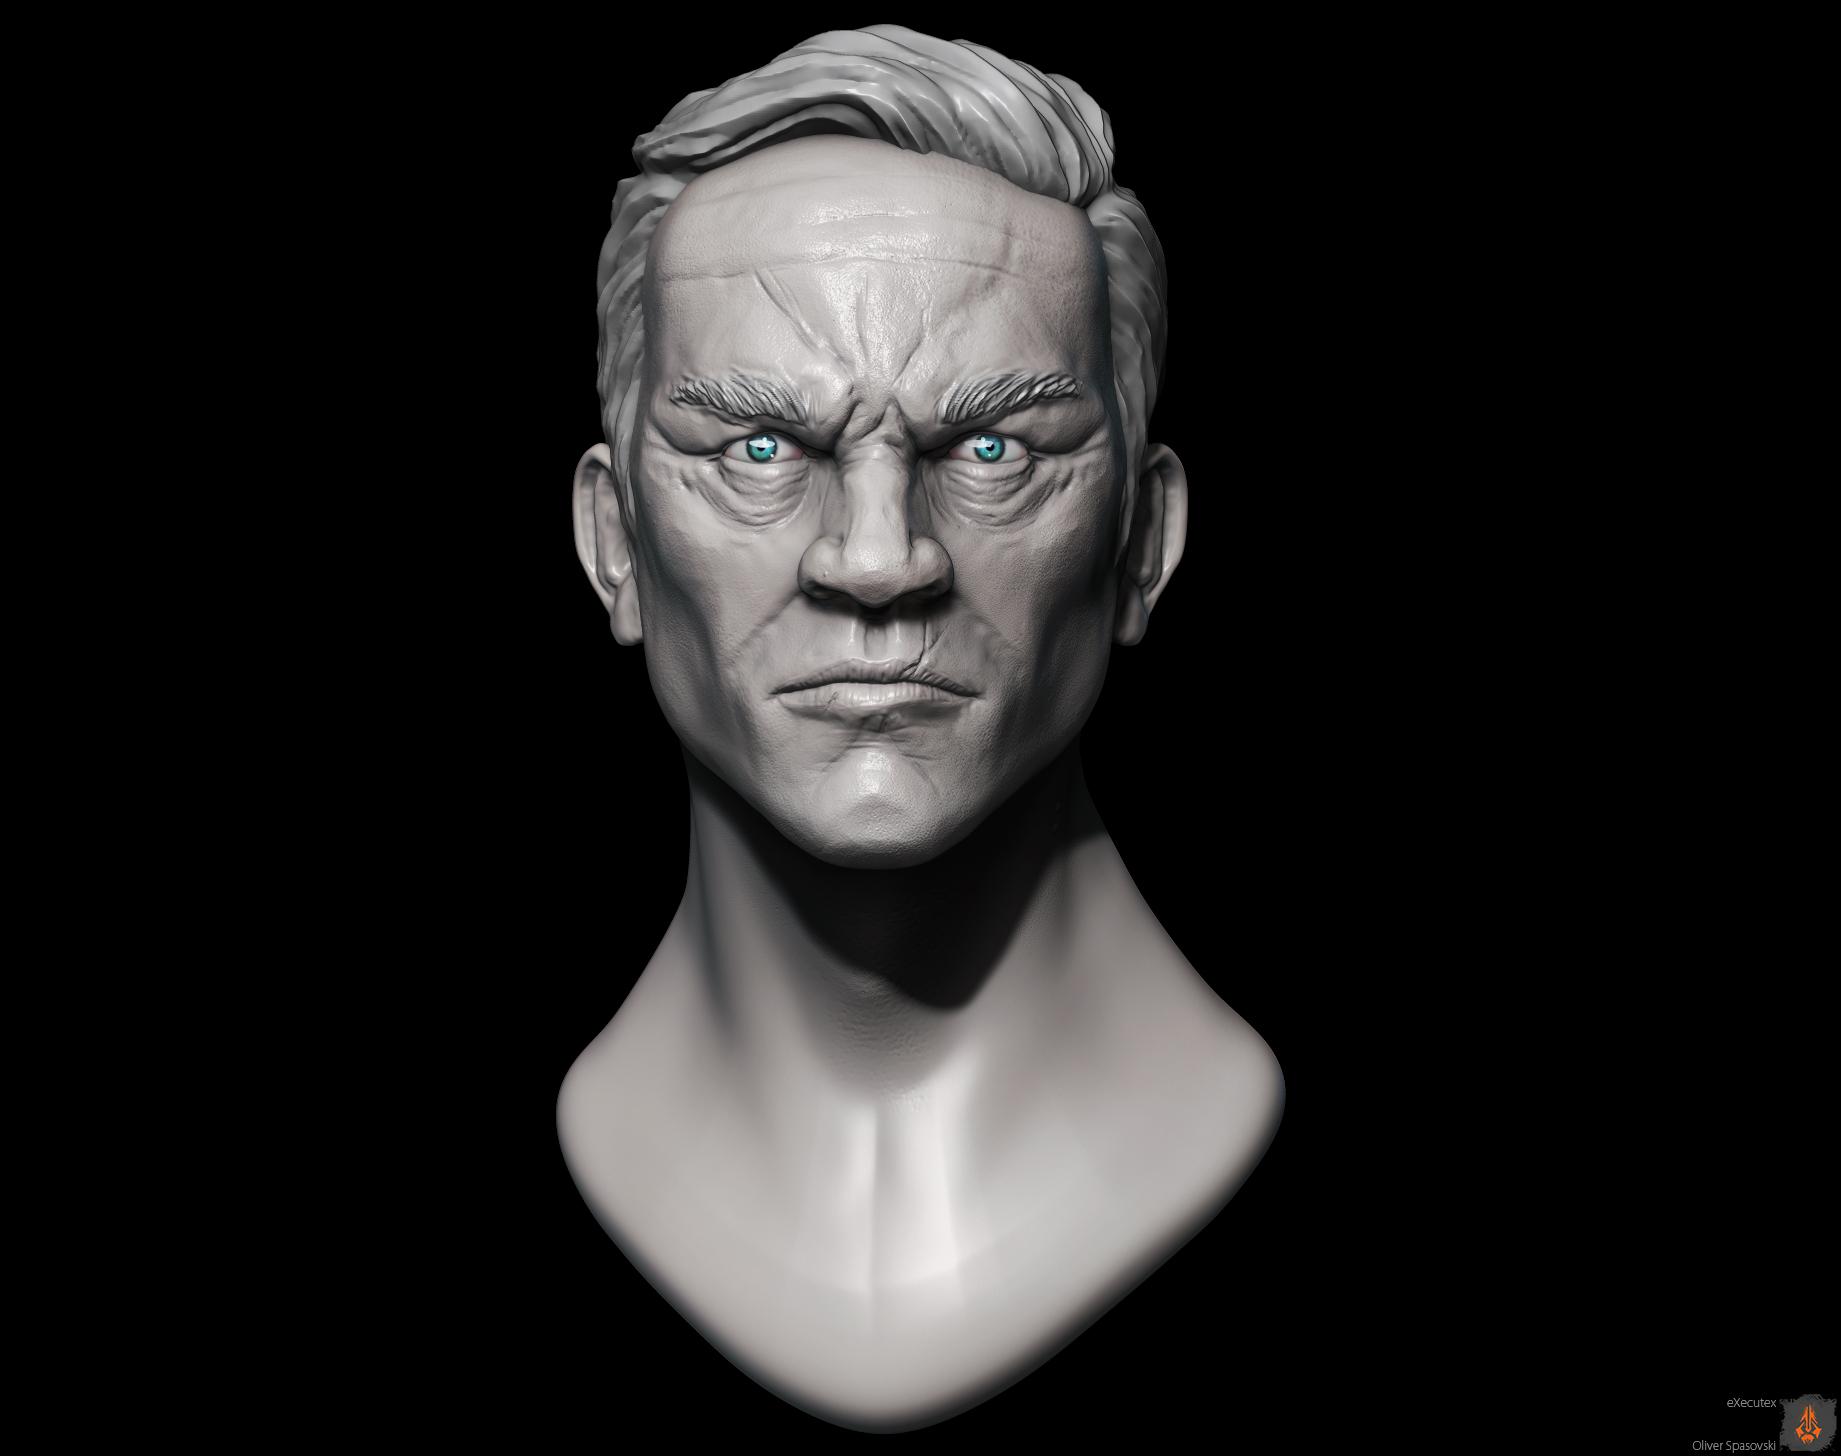 gang_bust_dishonored_sculpt_by_executex-d6yug1v.jpg